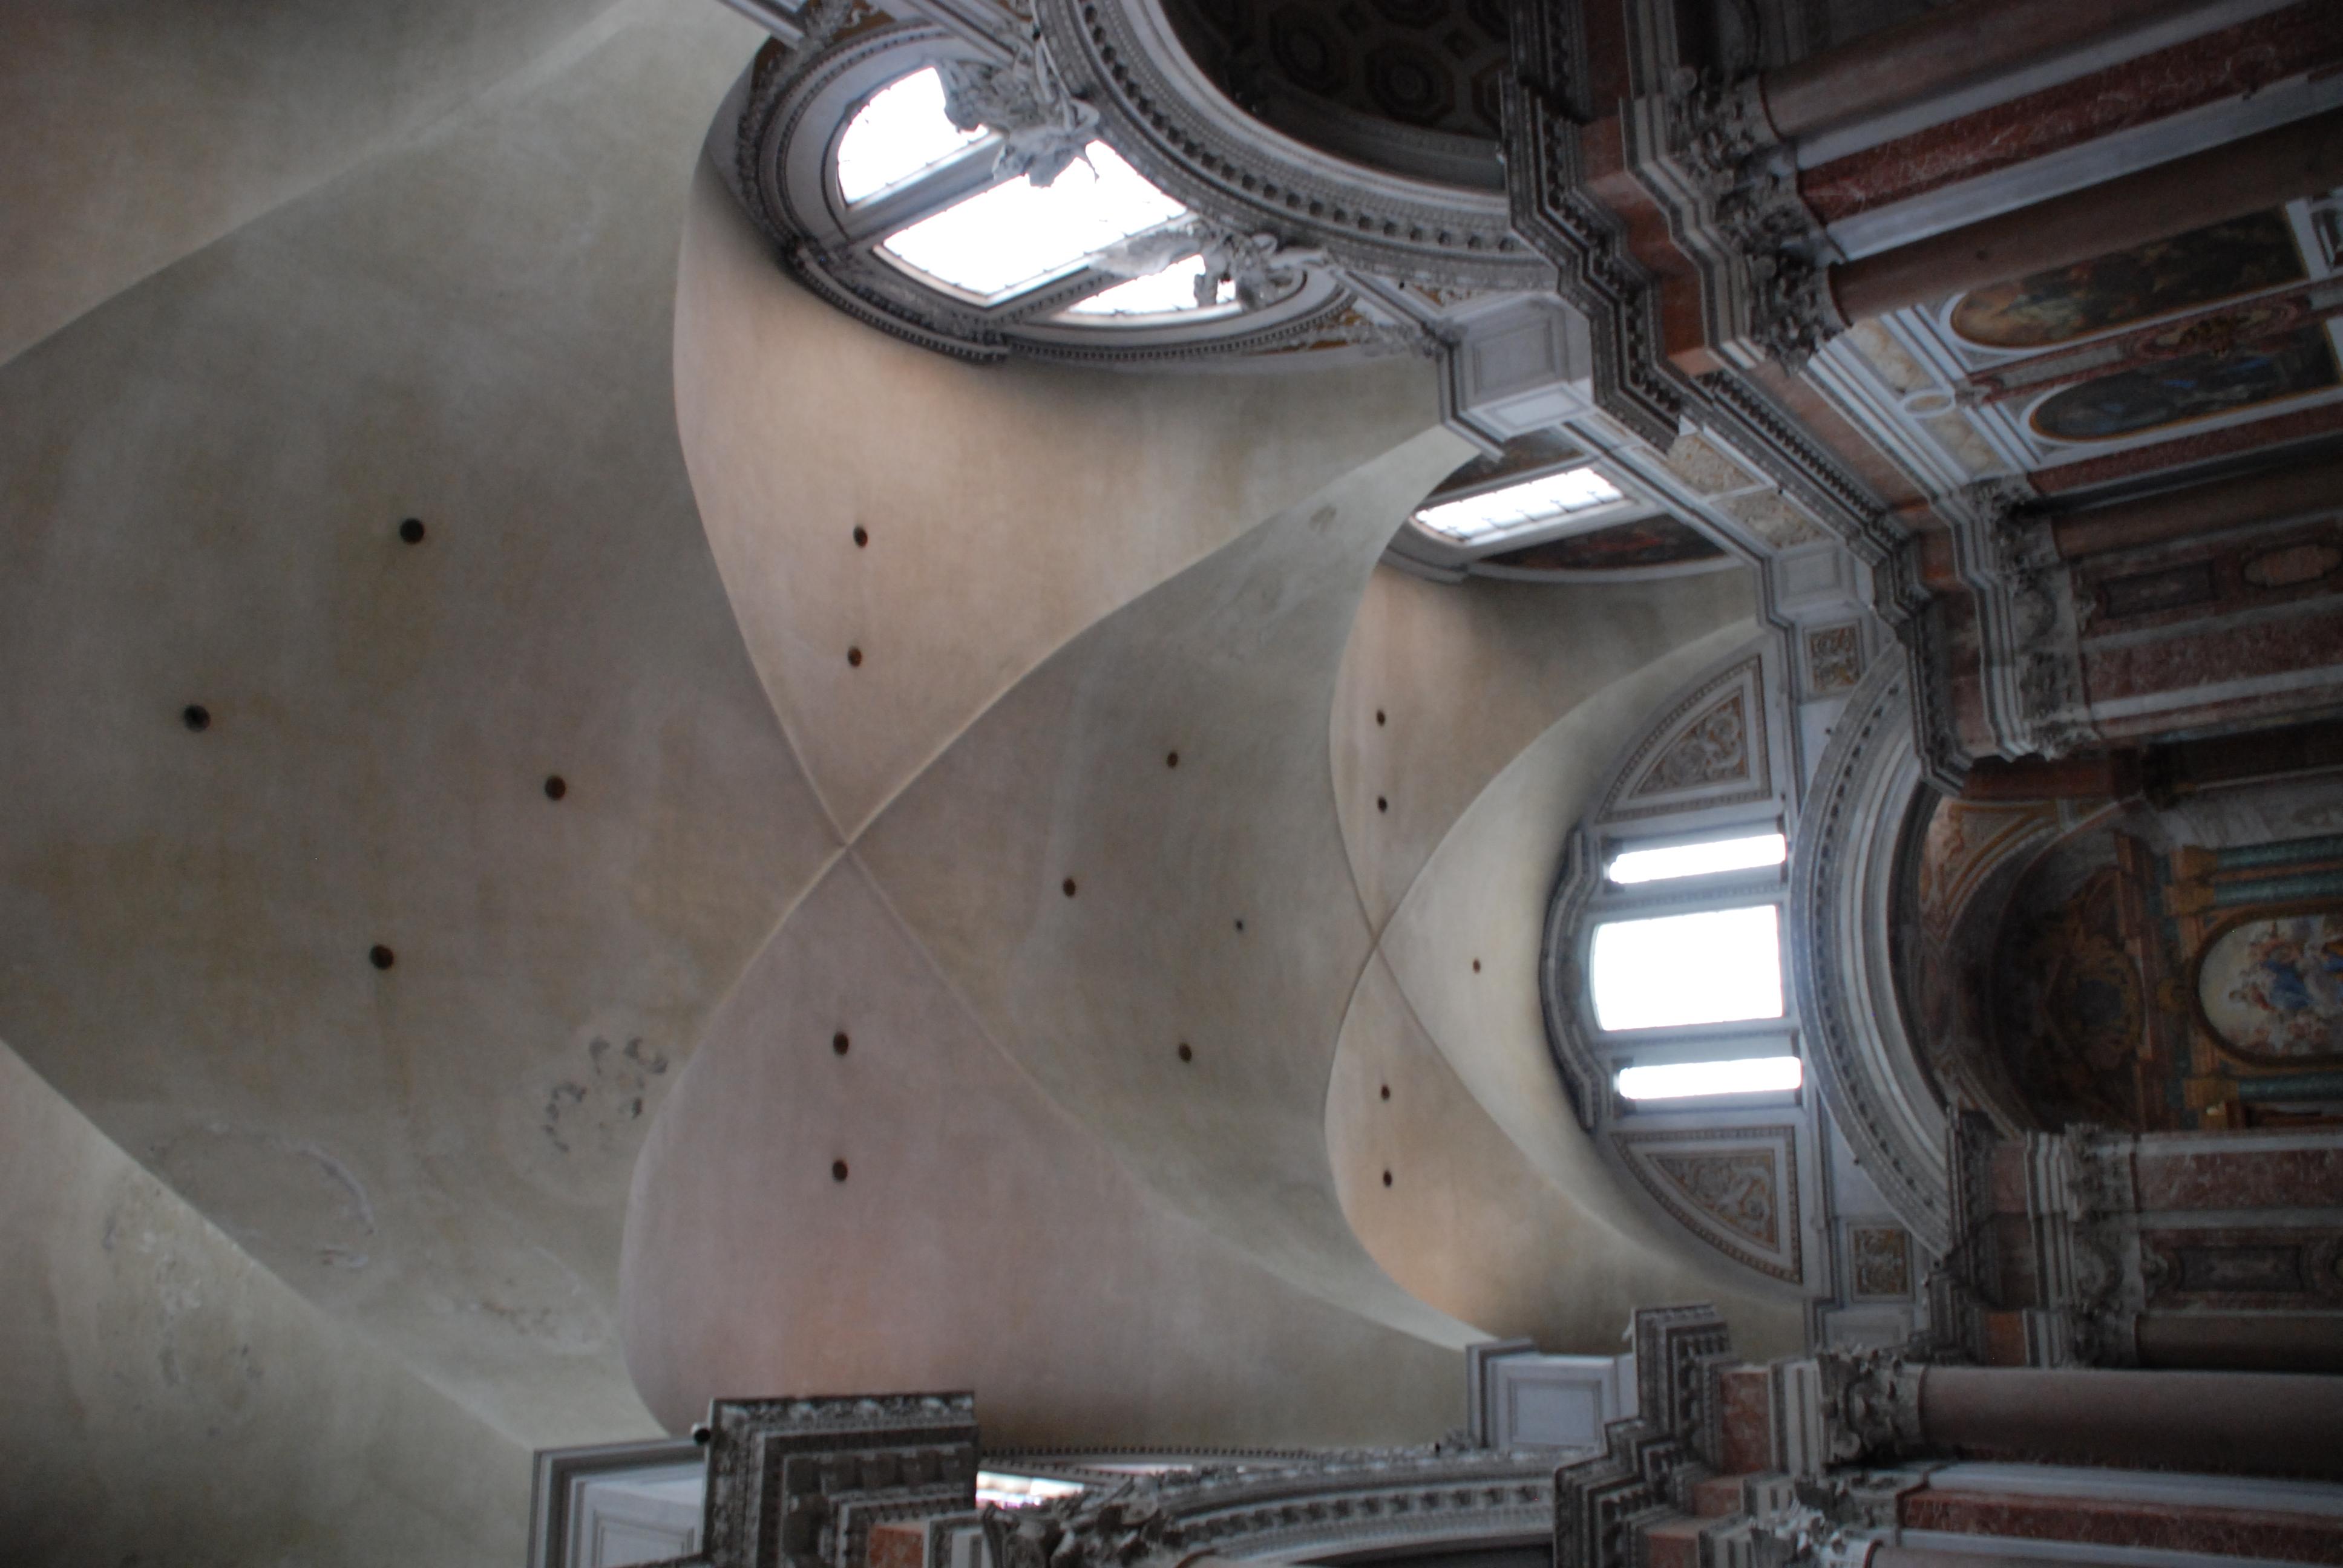 Roman ceiling